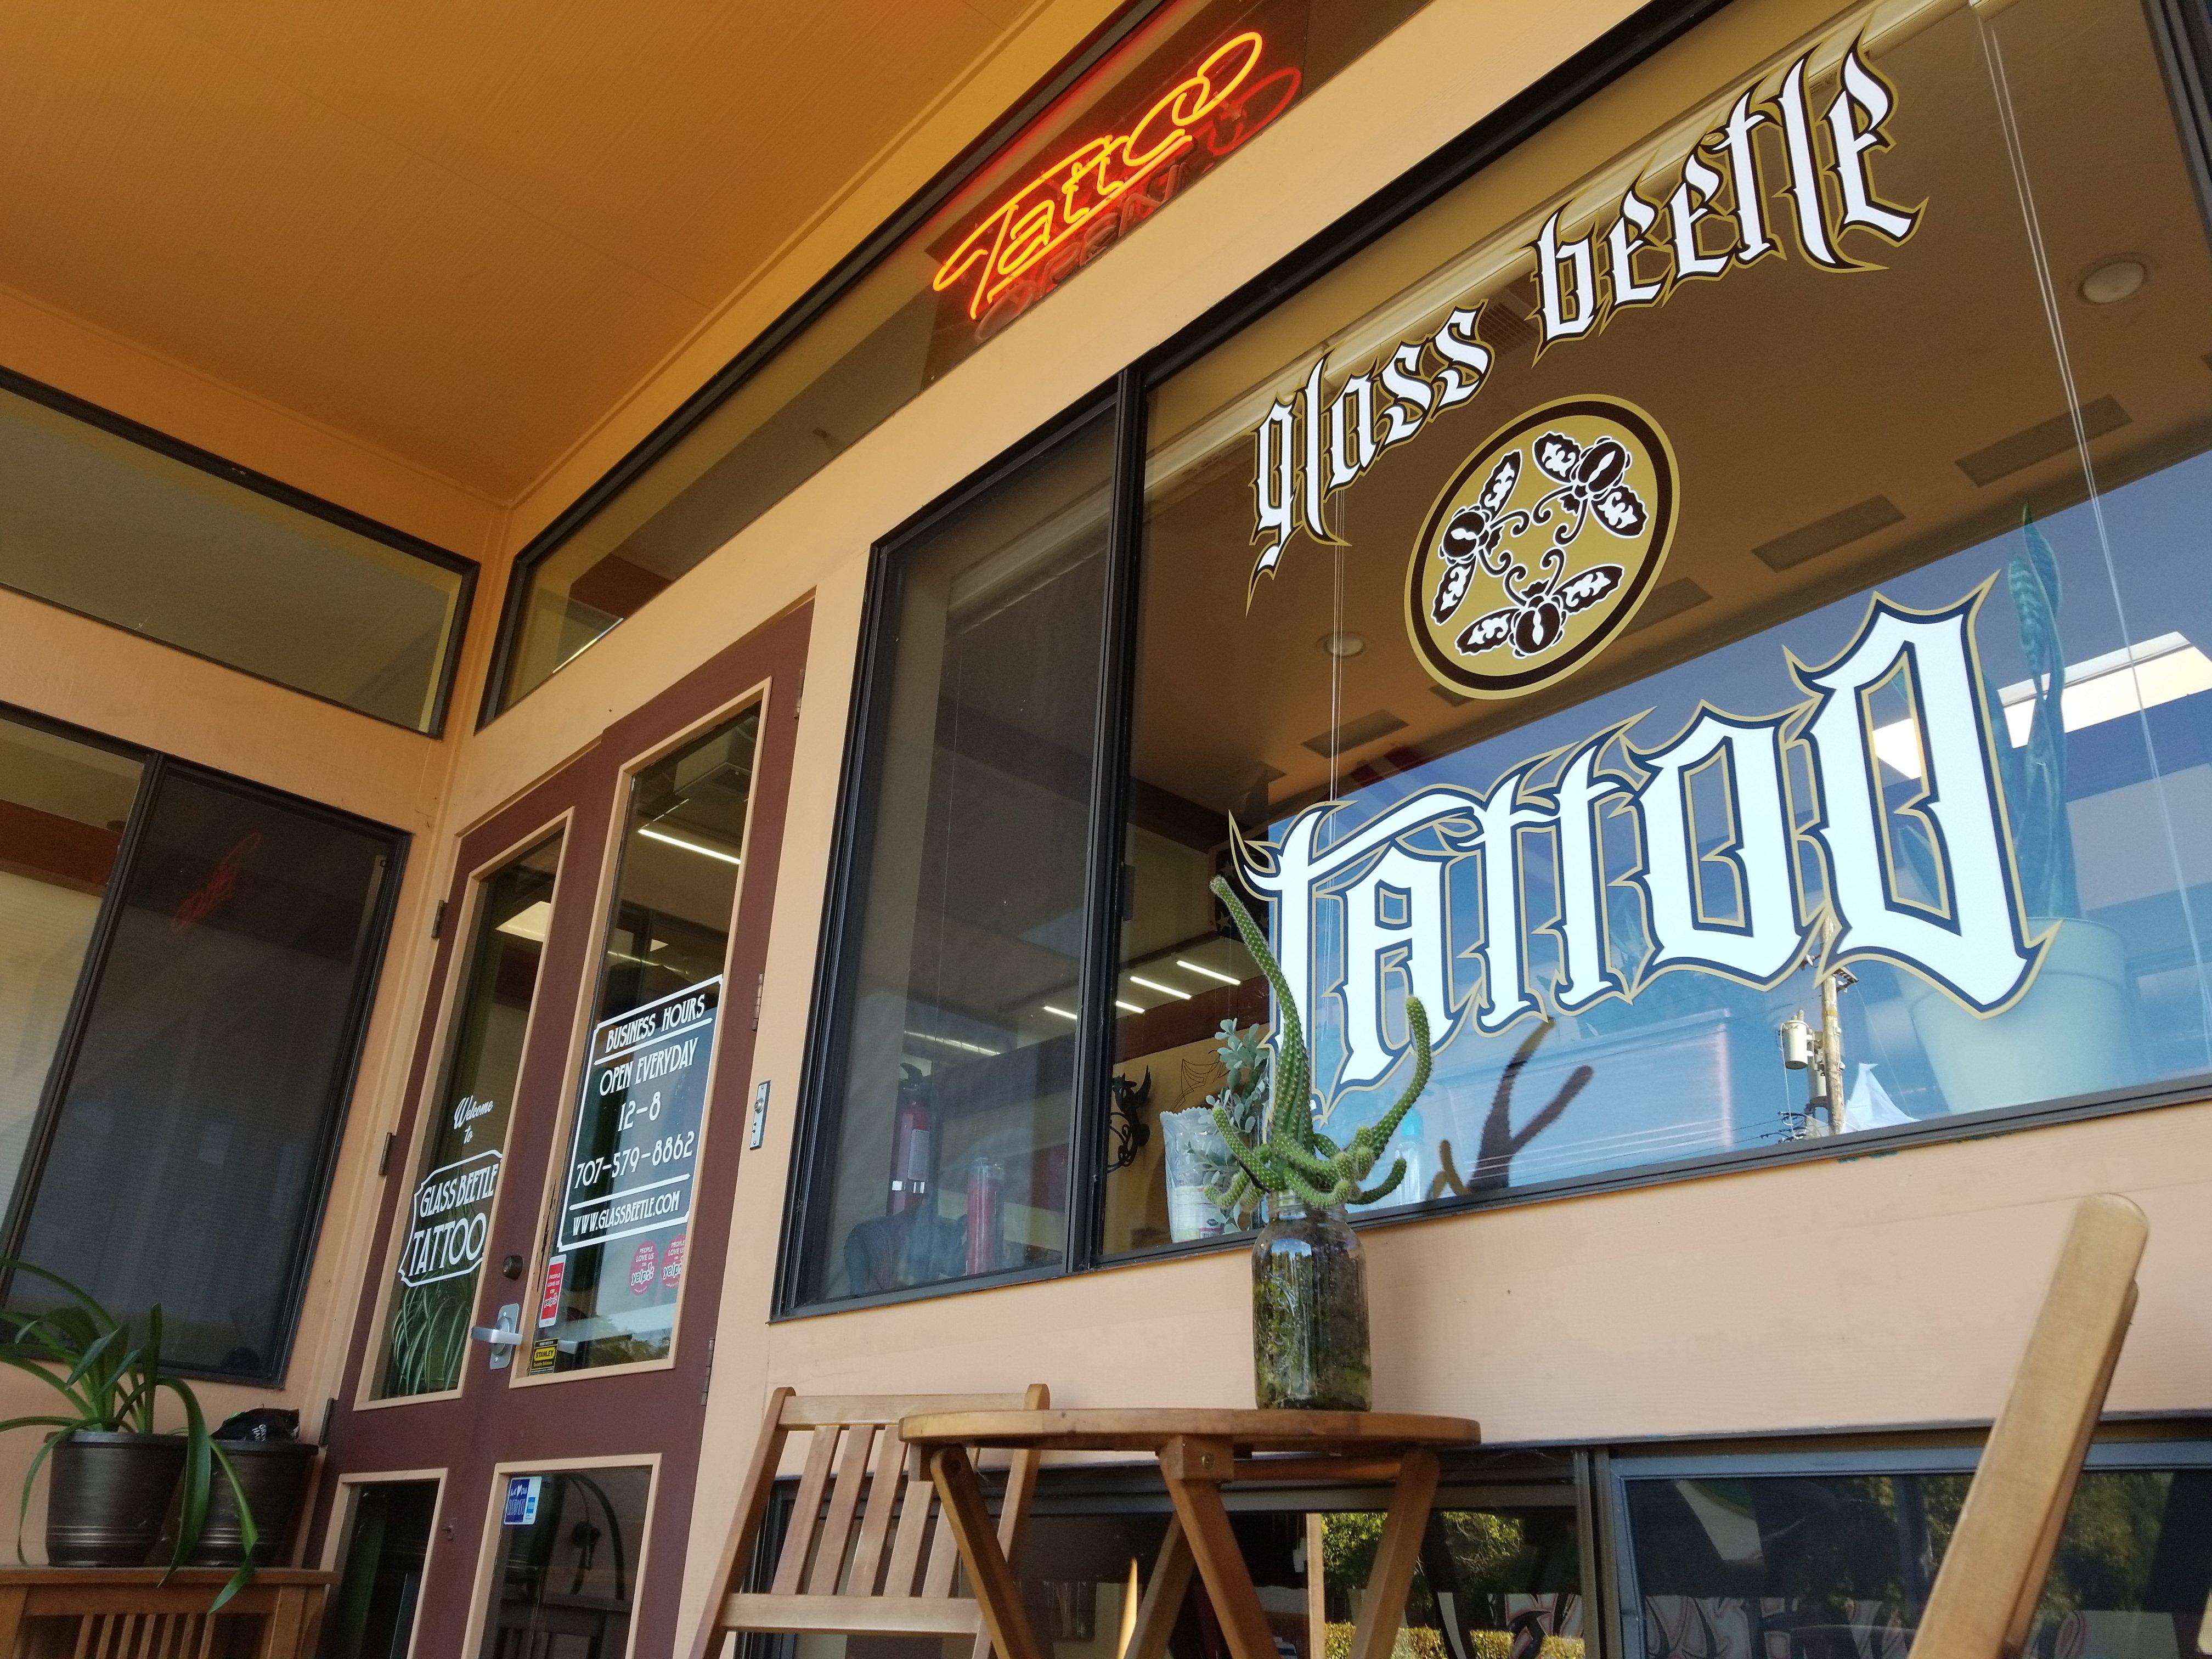 Glass Beetle Tattoo Shop Santa Rosa, CA